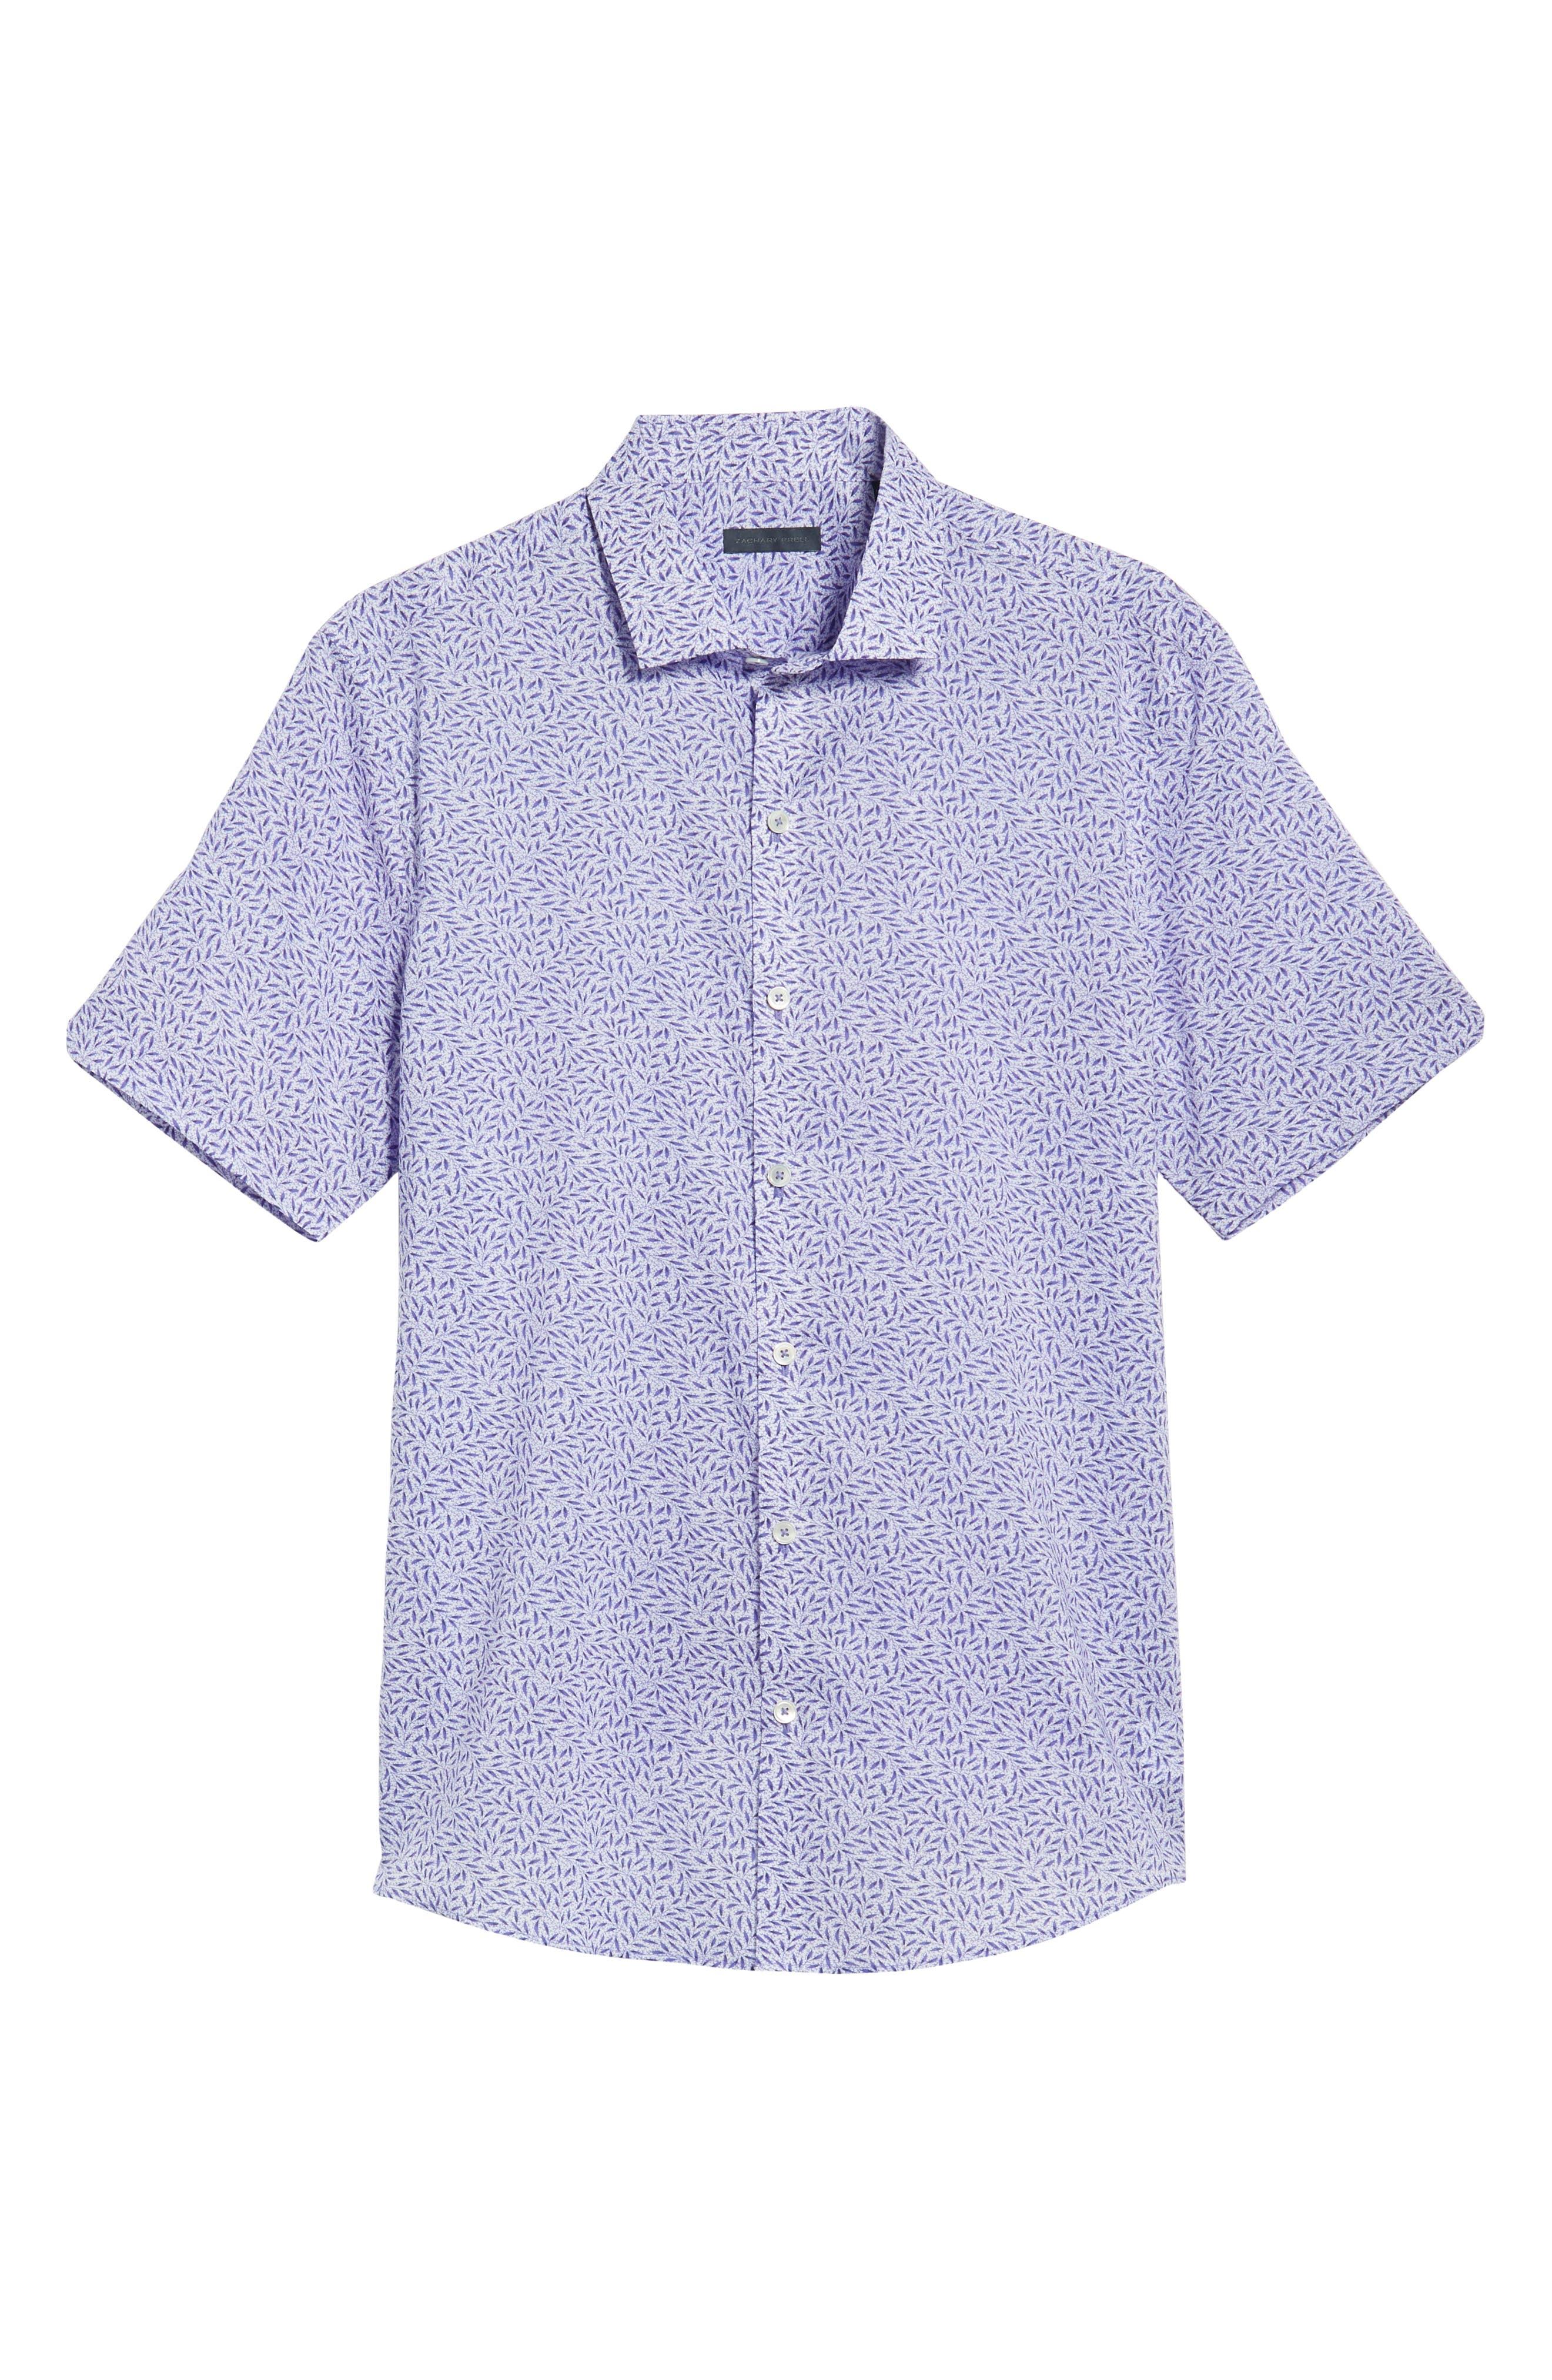 ZACHARY PRELL, Stiller Regular Fit Sport Shirt, Alternate thumbnail 6, color, PURPLE